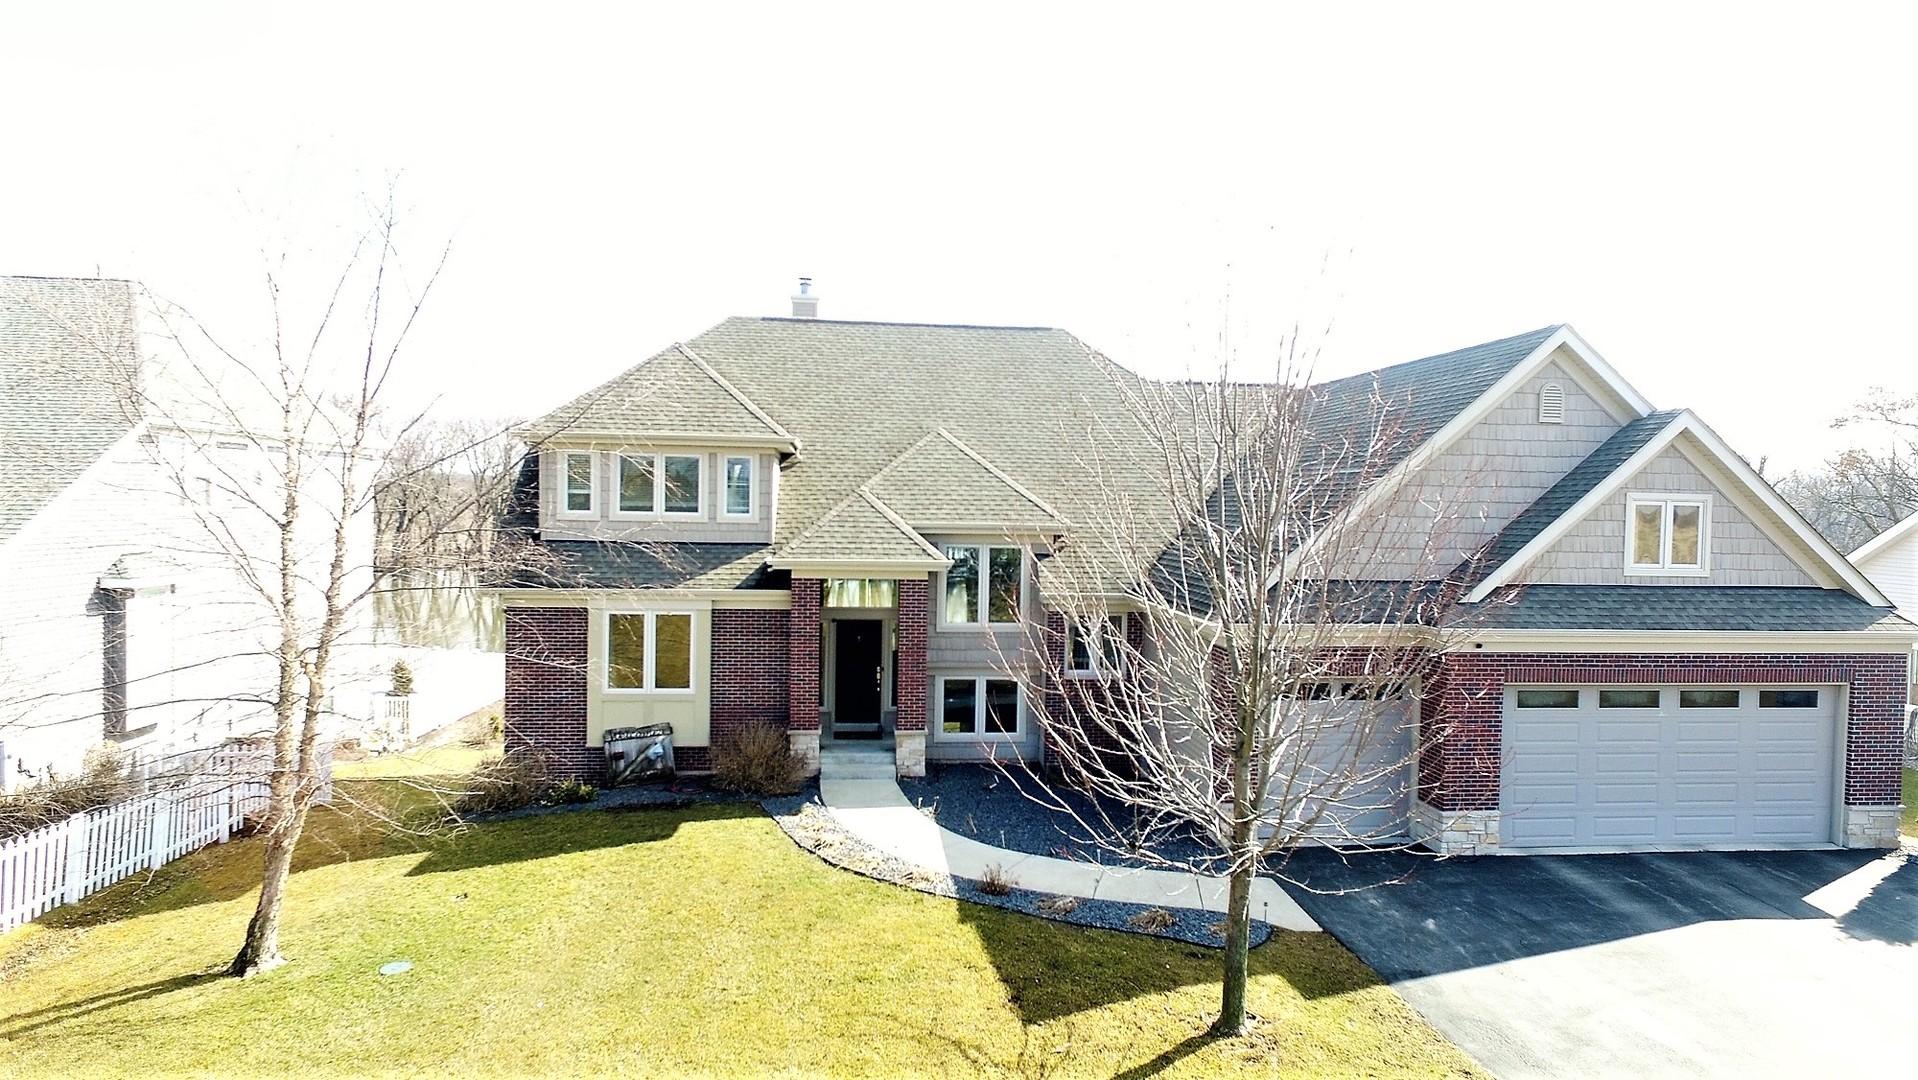 9611 Brenda, Roscoe, Illinois, 61073